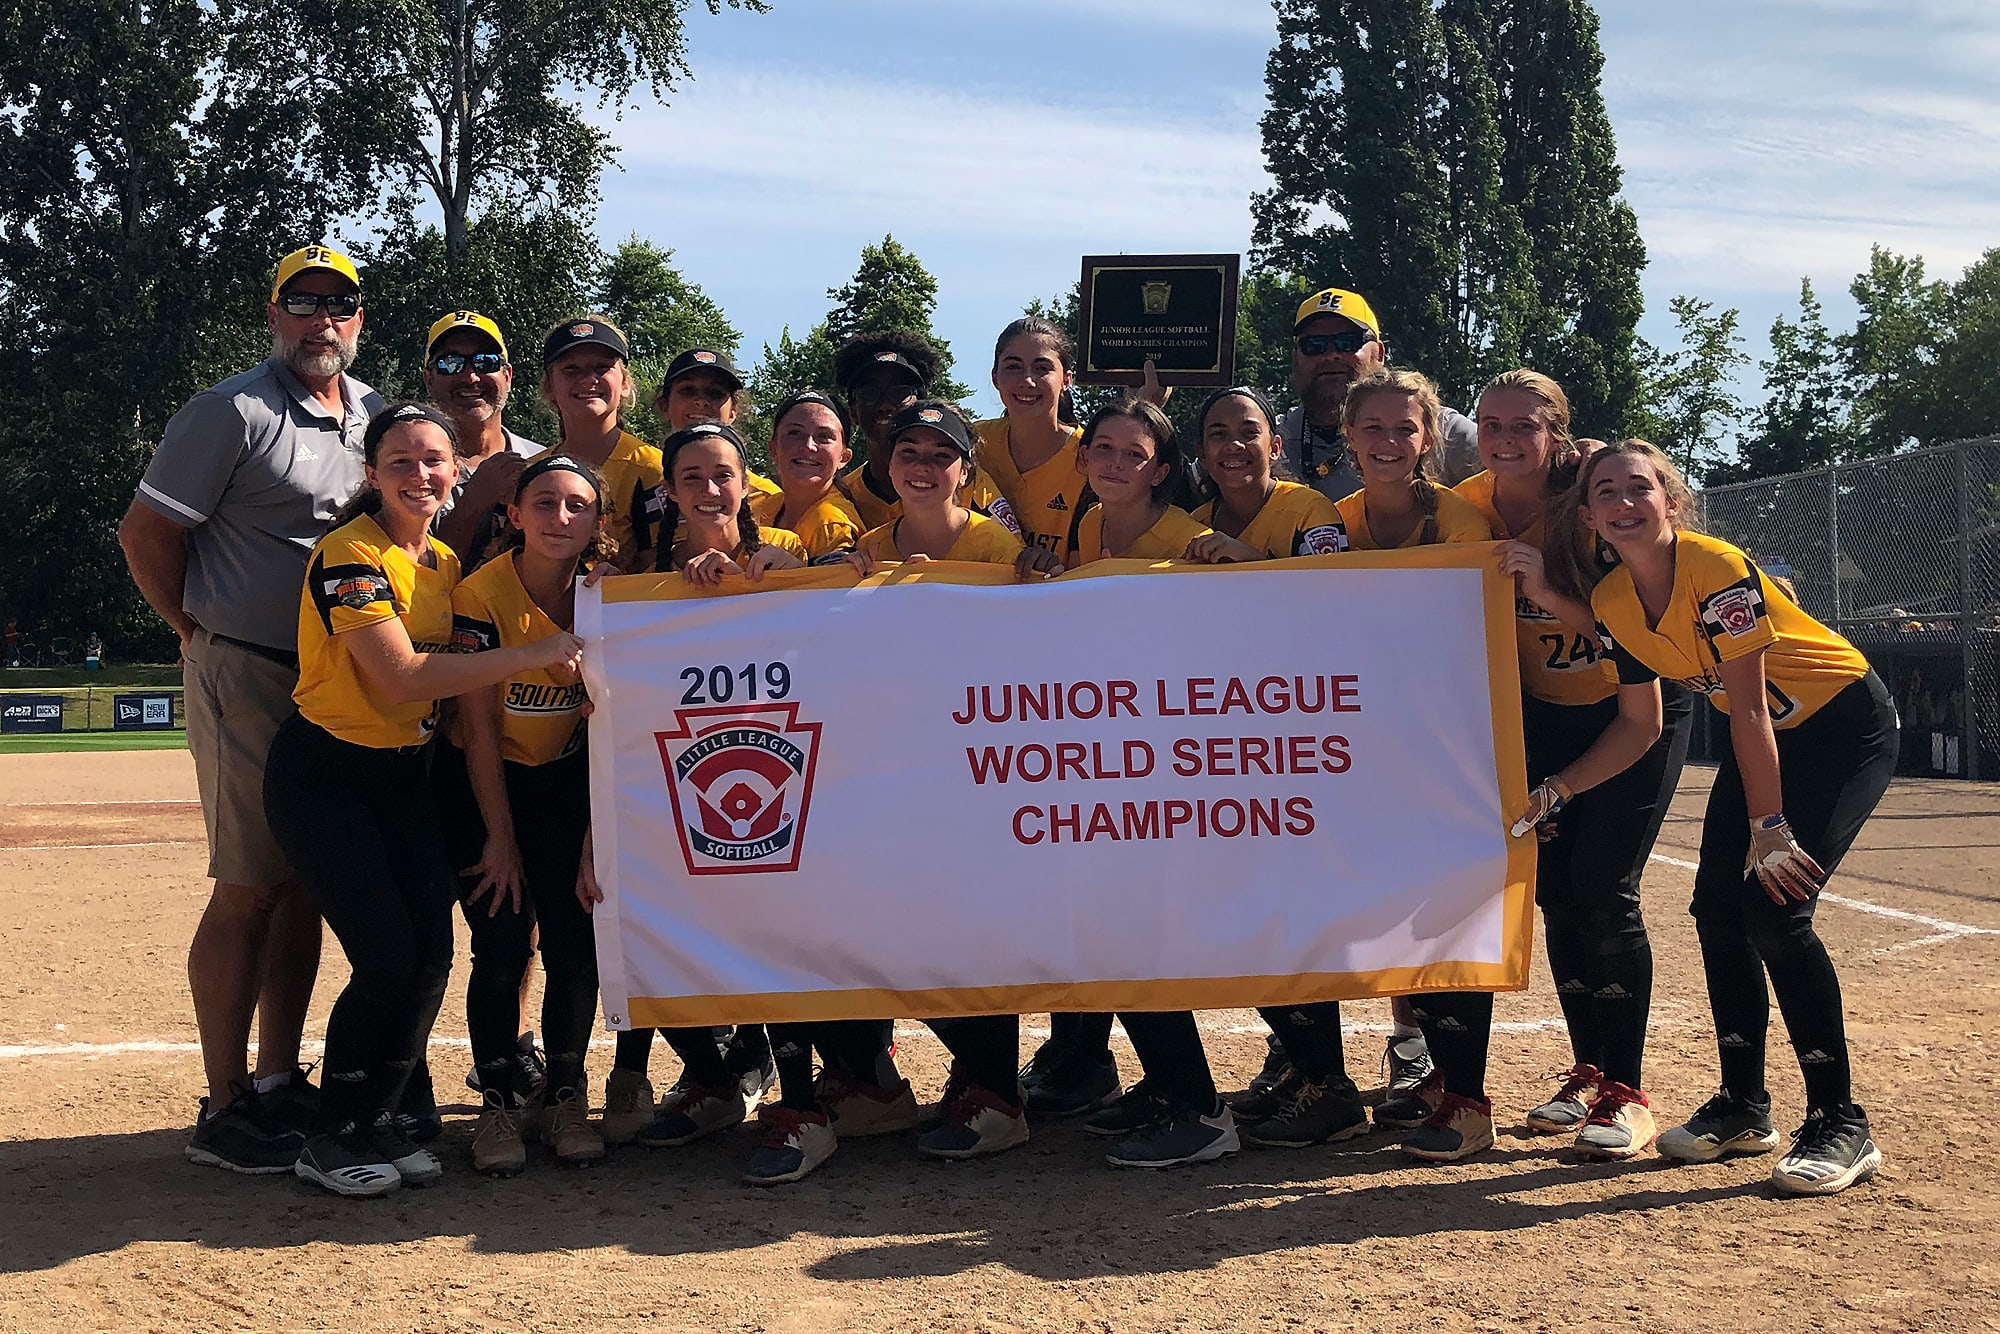 jlsbws-champs-2019